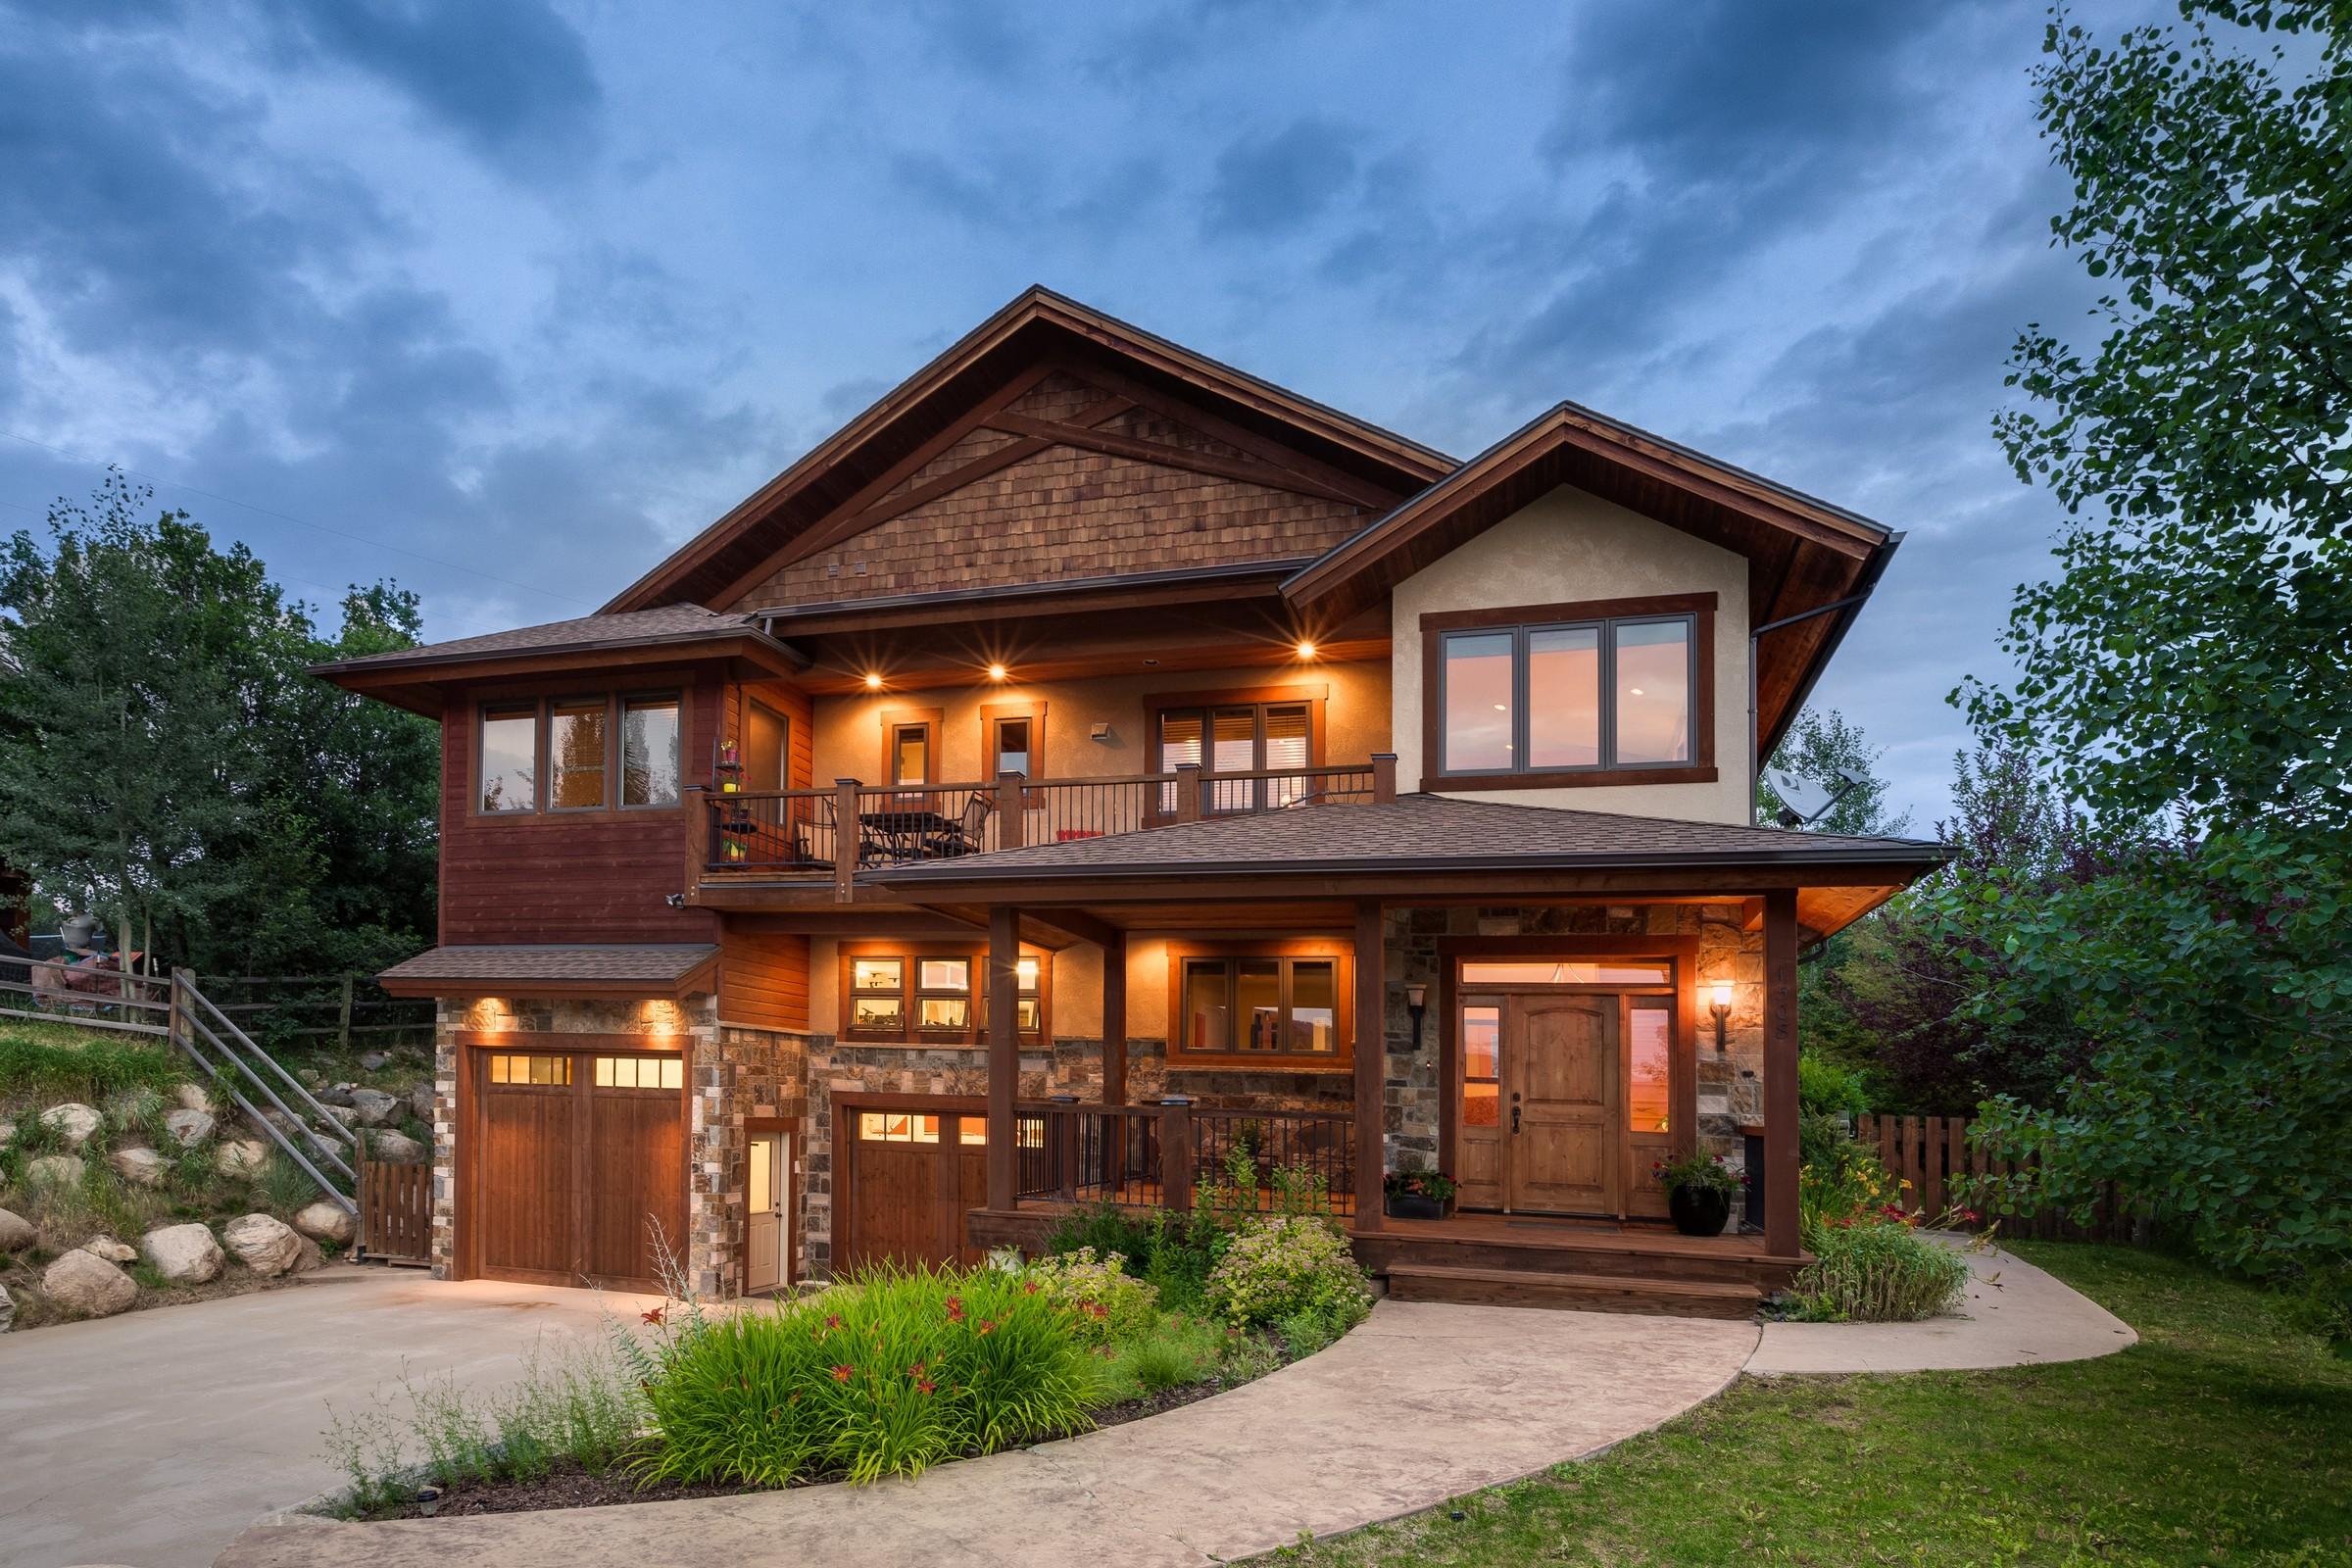 Maison unifamiliale pour l Vente à Custom Home on Harwig Circle 1508 Harwig Circle Steamboat Springs, Colorado, 80487 États-Unis